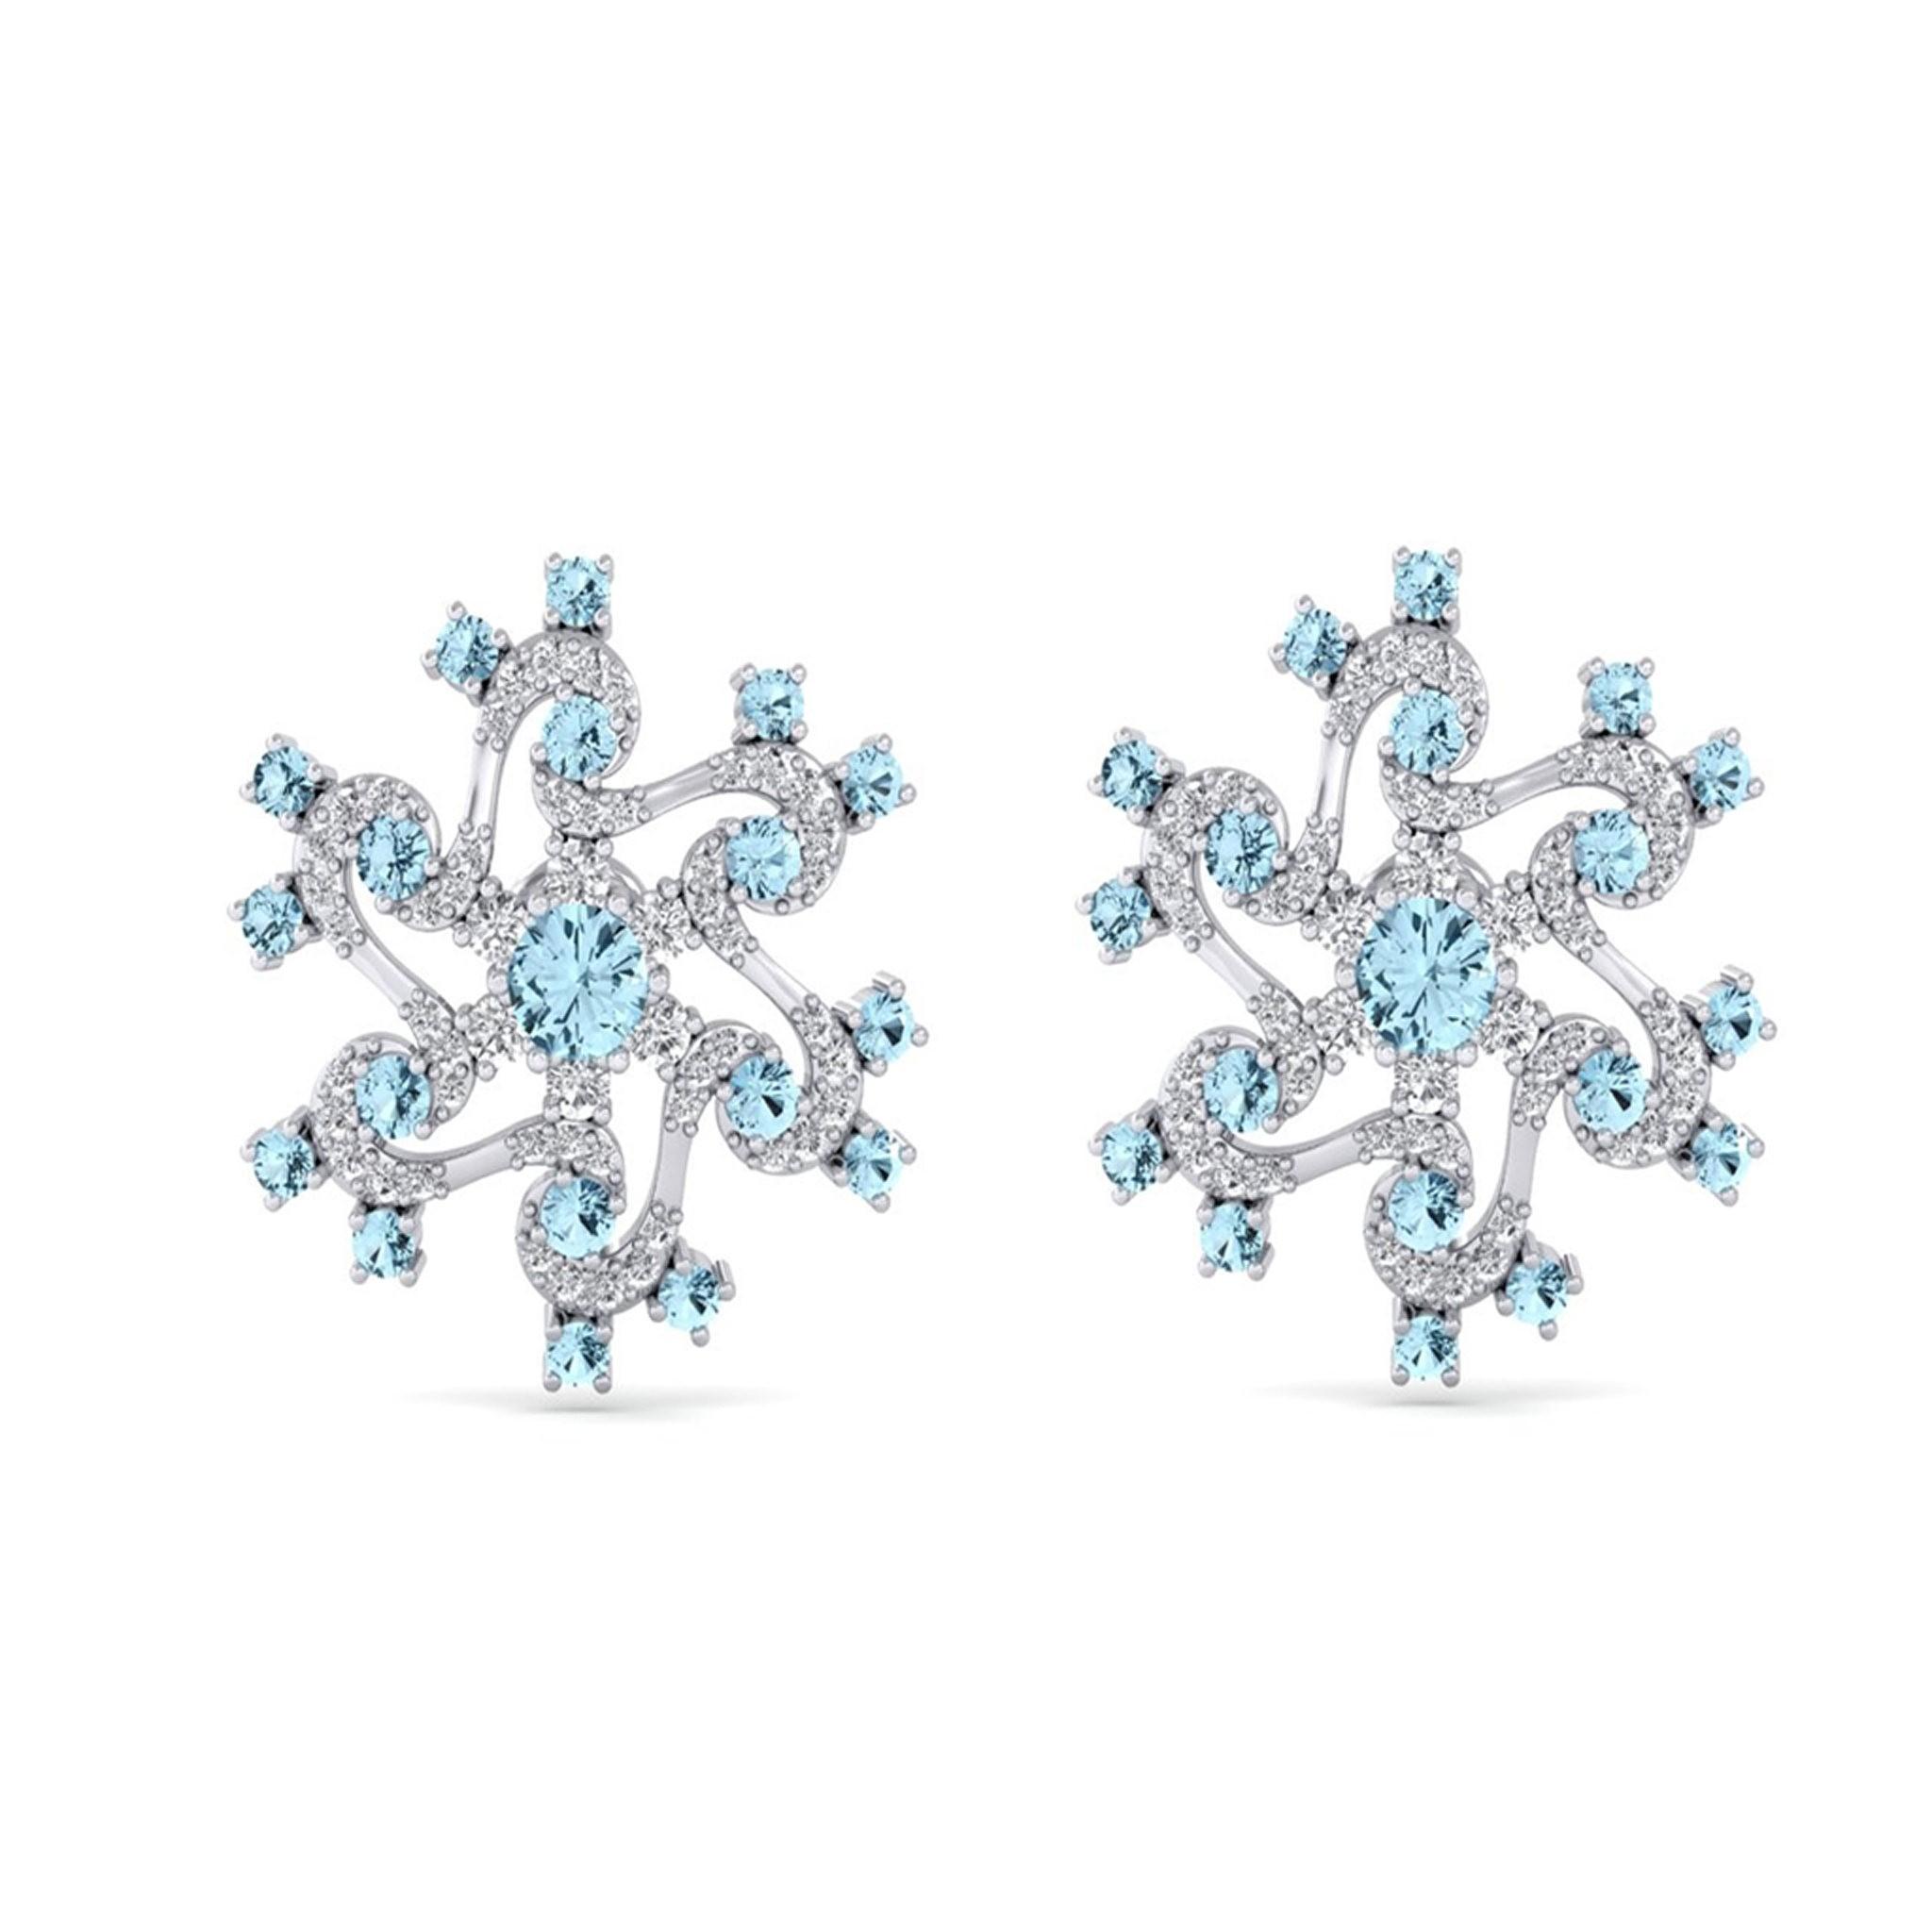 Diamond Earrings with Blue Gemstones